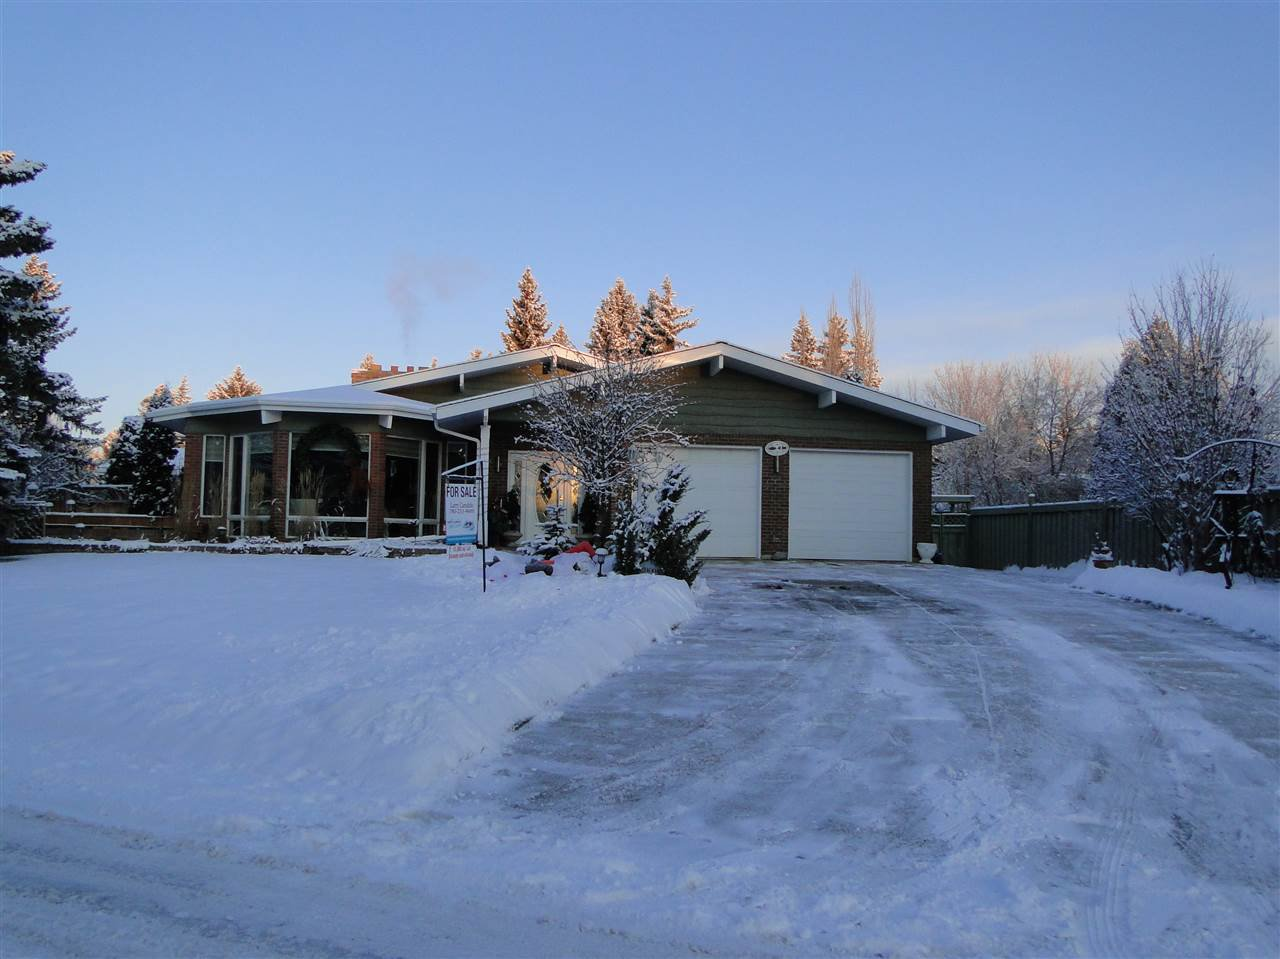 Main Photo: 14004 47 Avenue in Edmonton: Zone 14 House for sale : MLS®# E4185286